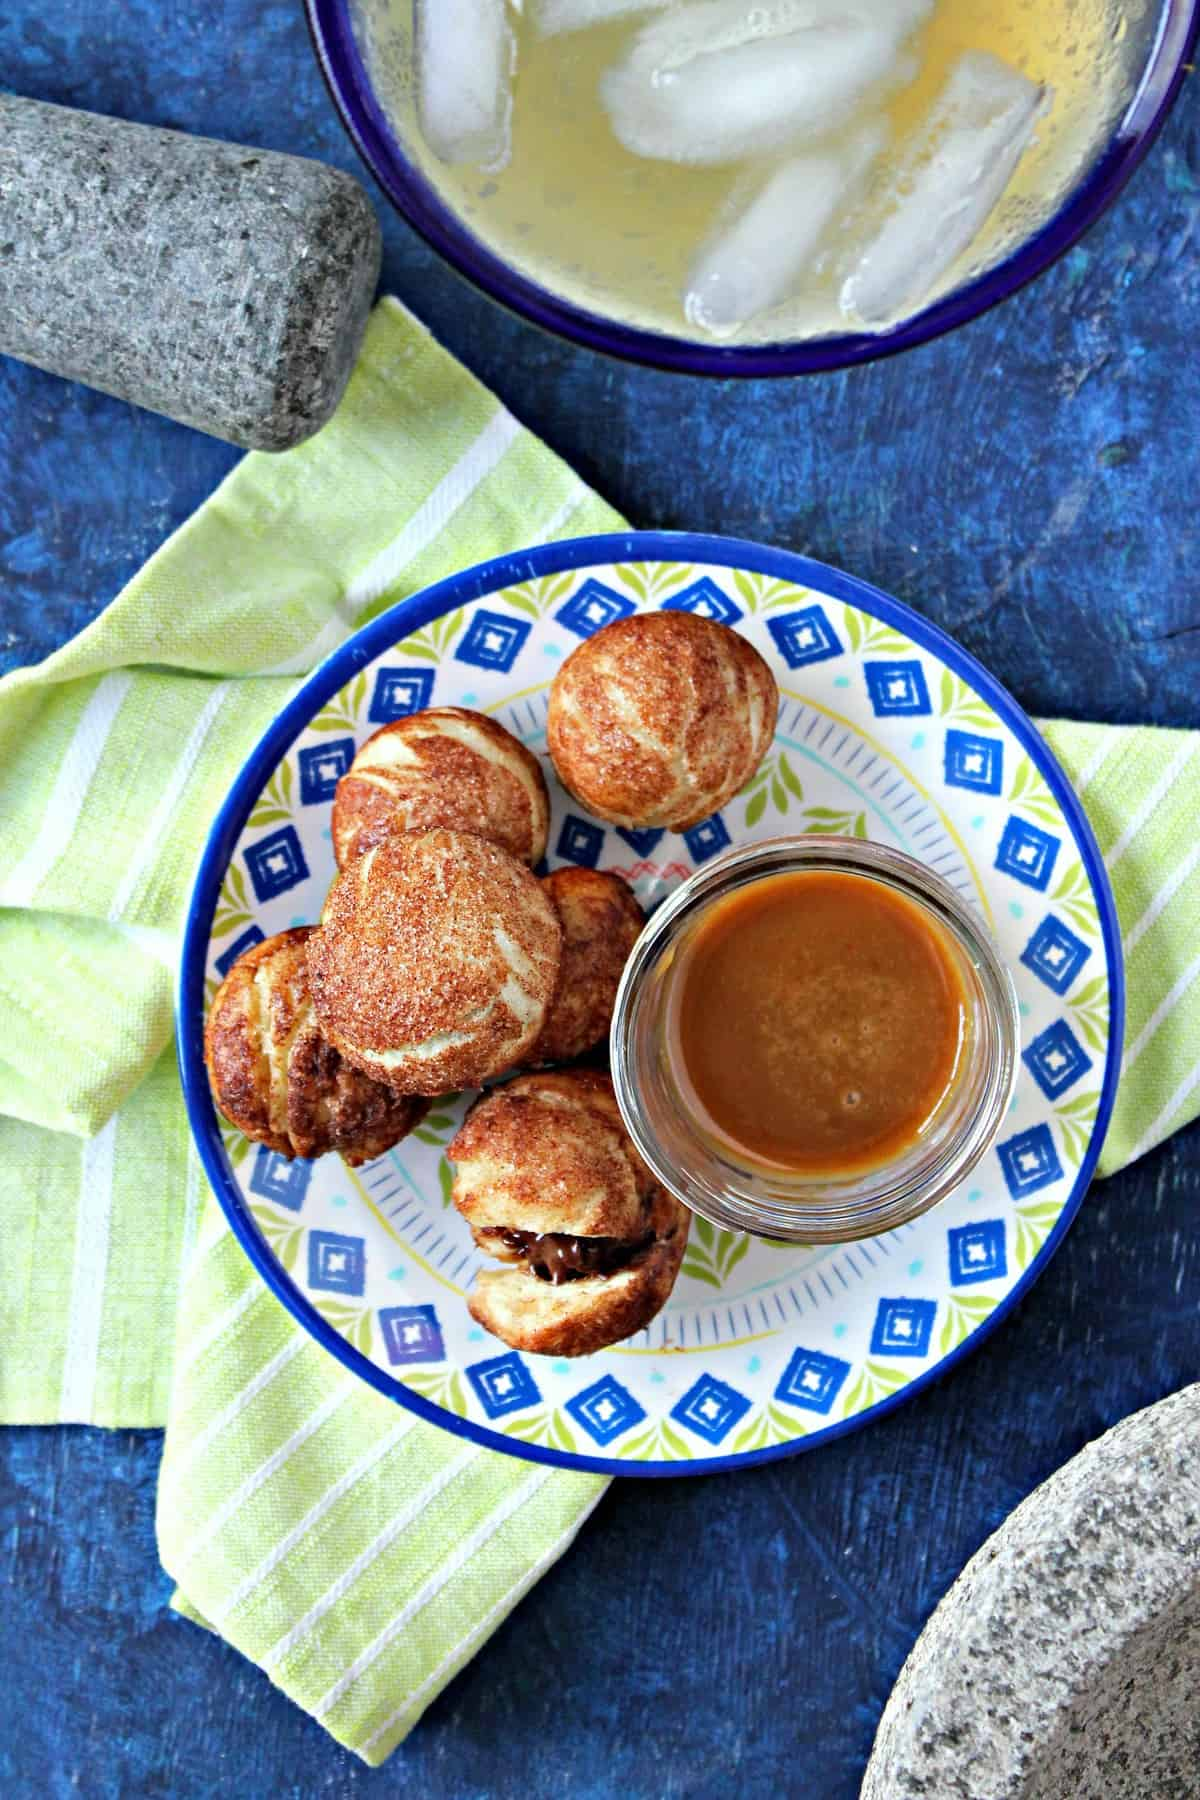 Dip these sweet churro balls in the sweet homemade caramel sauce